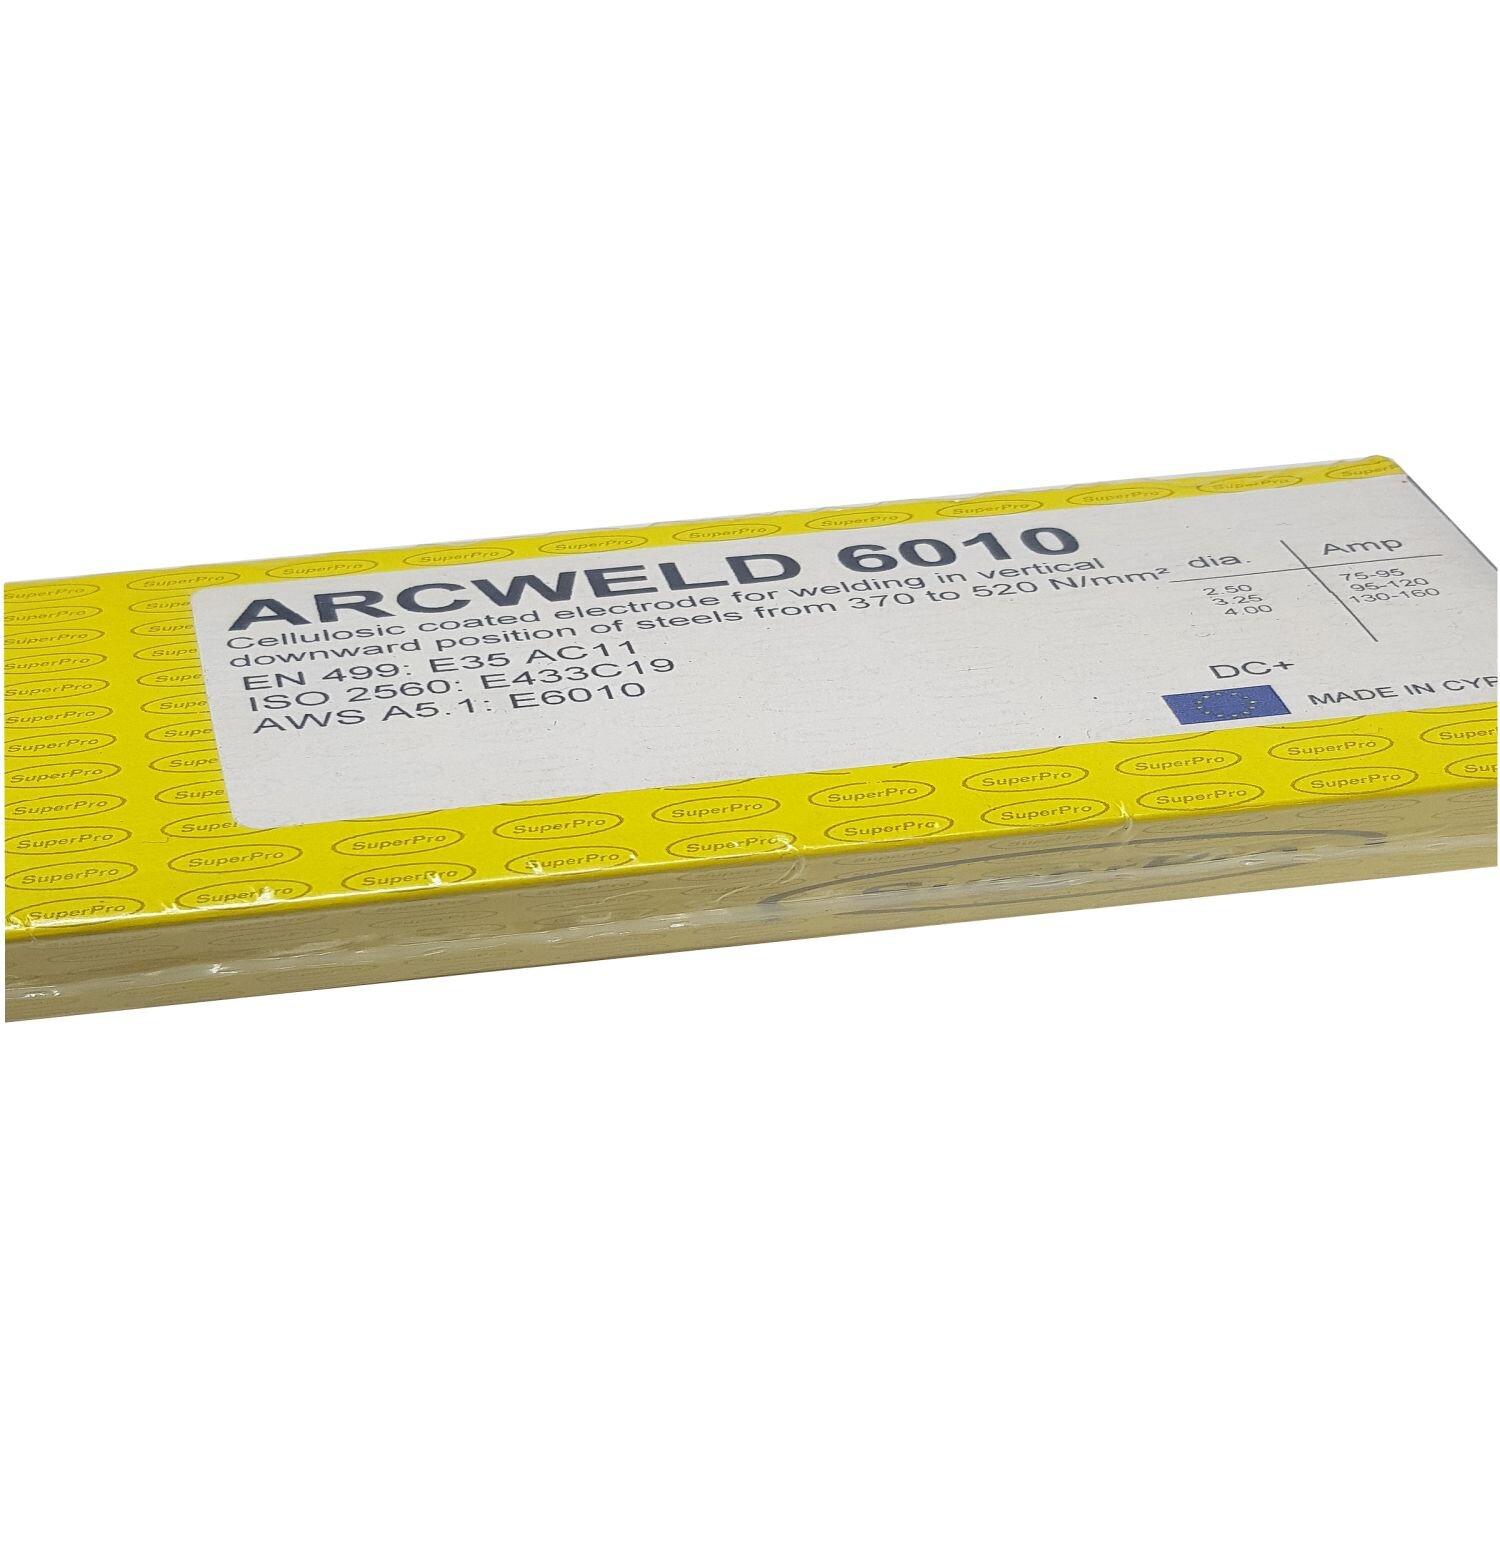 Superpro Arcweld 6010 Cellulosic Pipe Welding Electrode